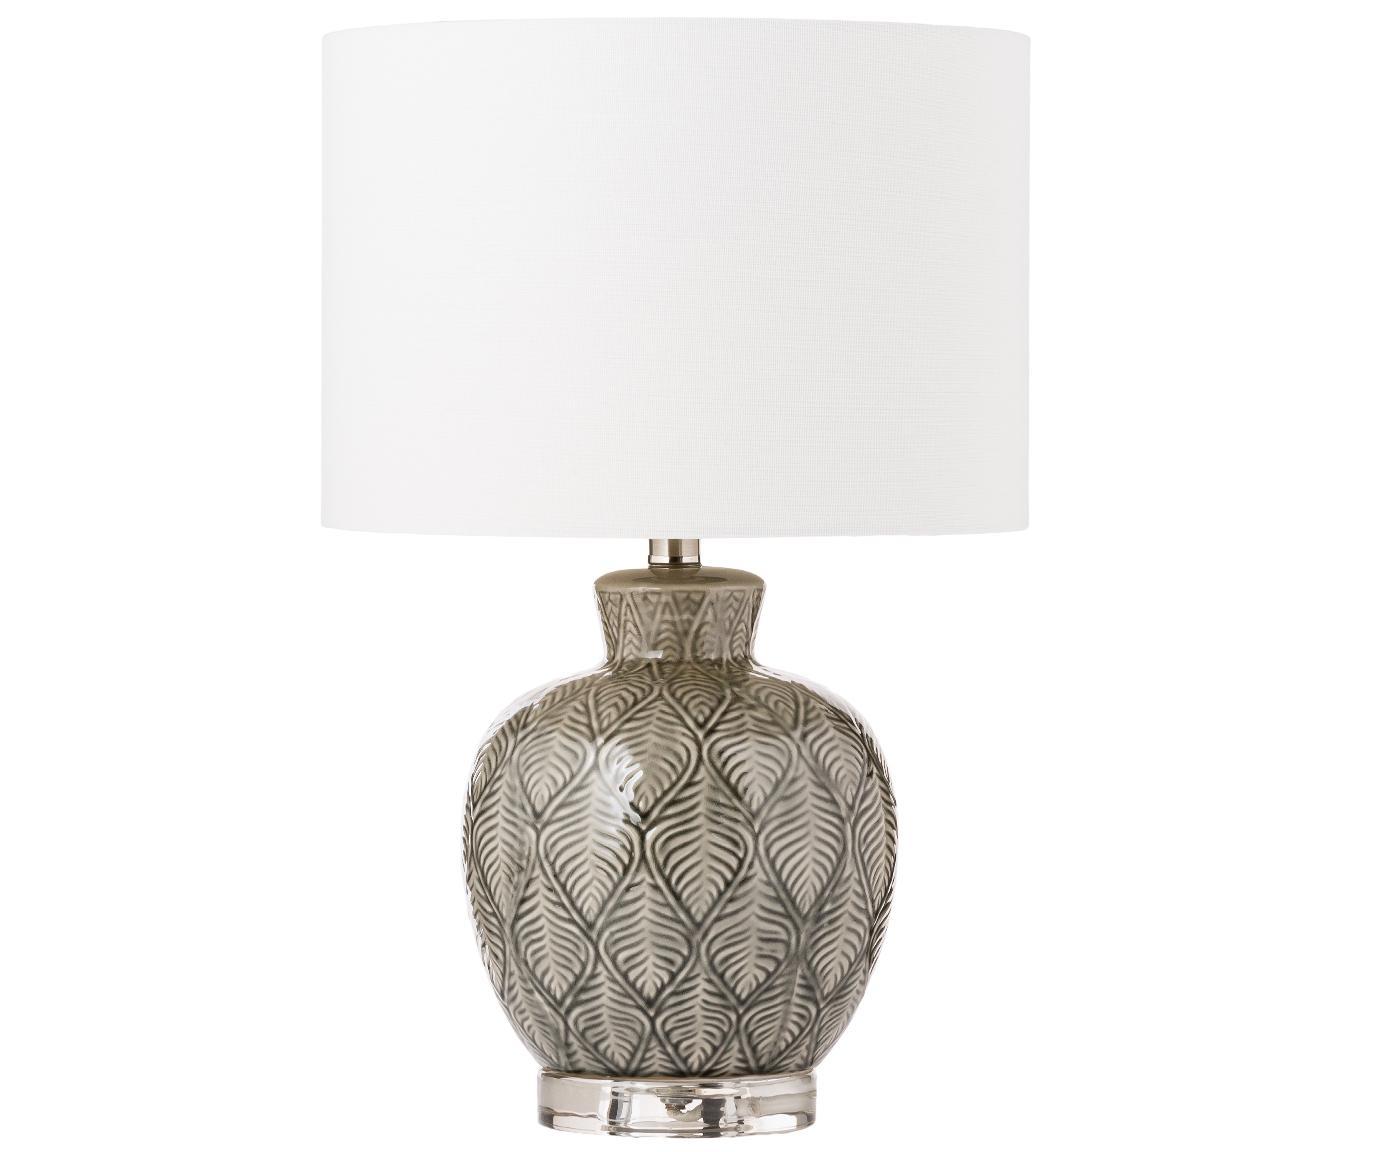 Keramik-Tischlampe Brooklyn im Boho-Style, Lampenschirm: Textil, Lampenfuß: Keramik, Sockel: Kristallglas, Weiß, Grau, Ø 33 x H 53 cm